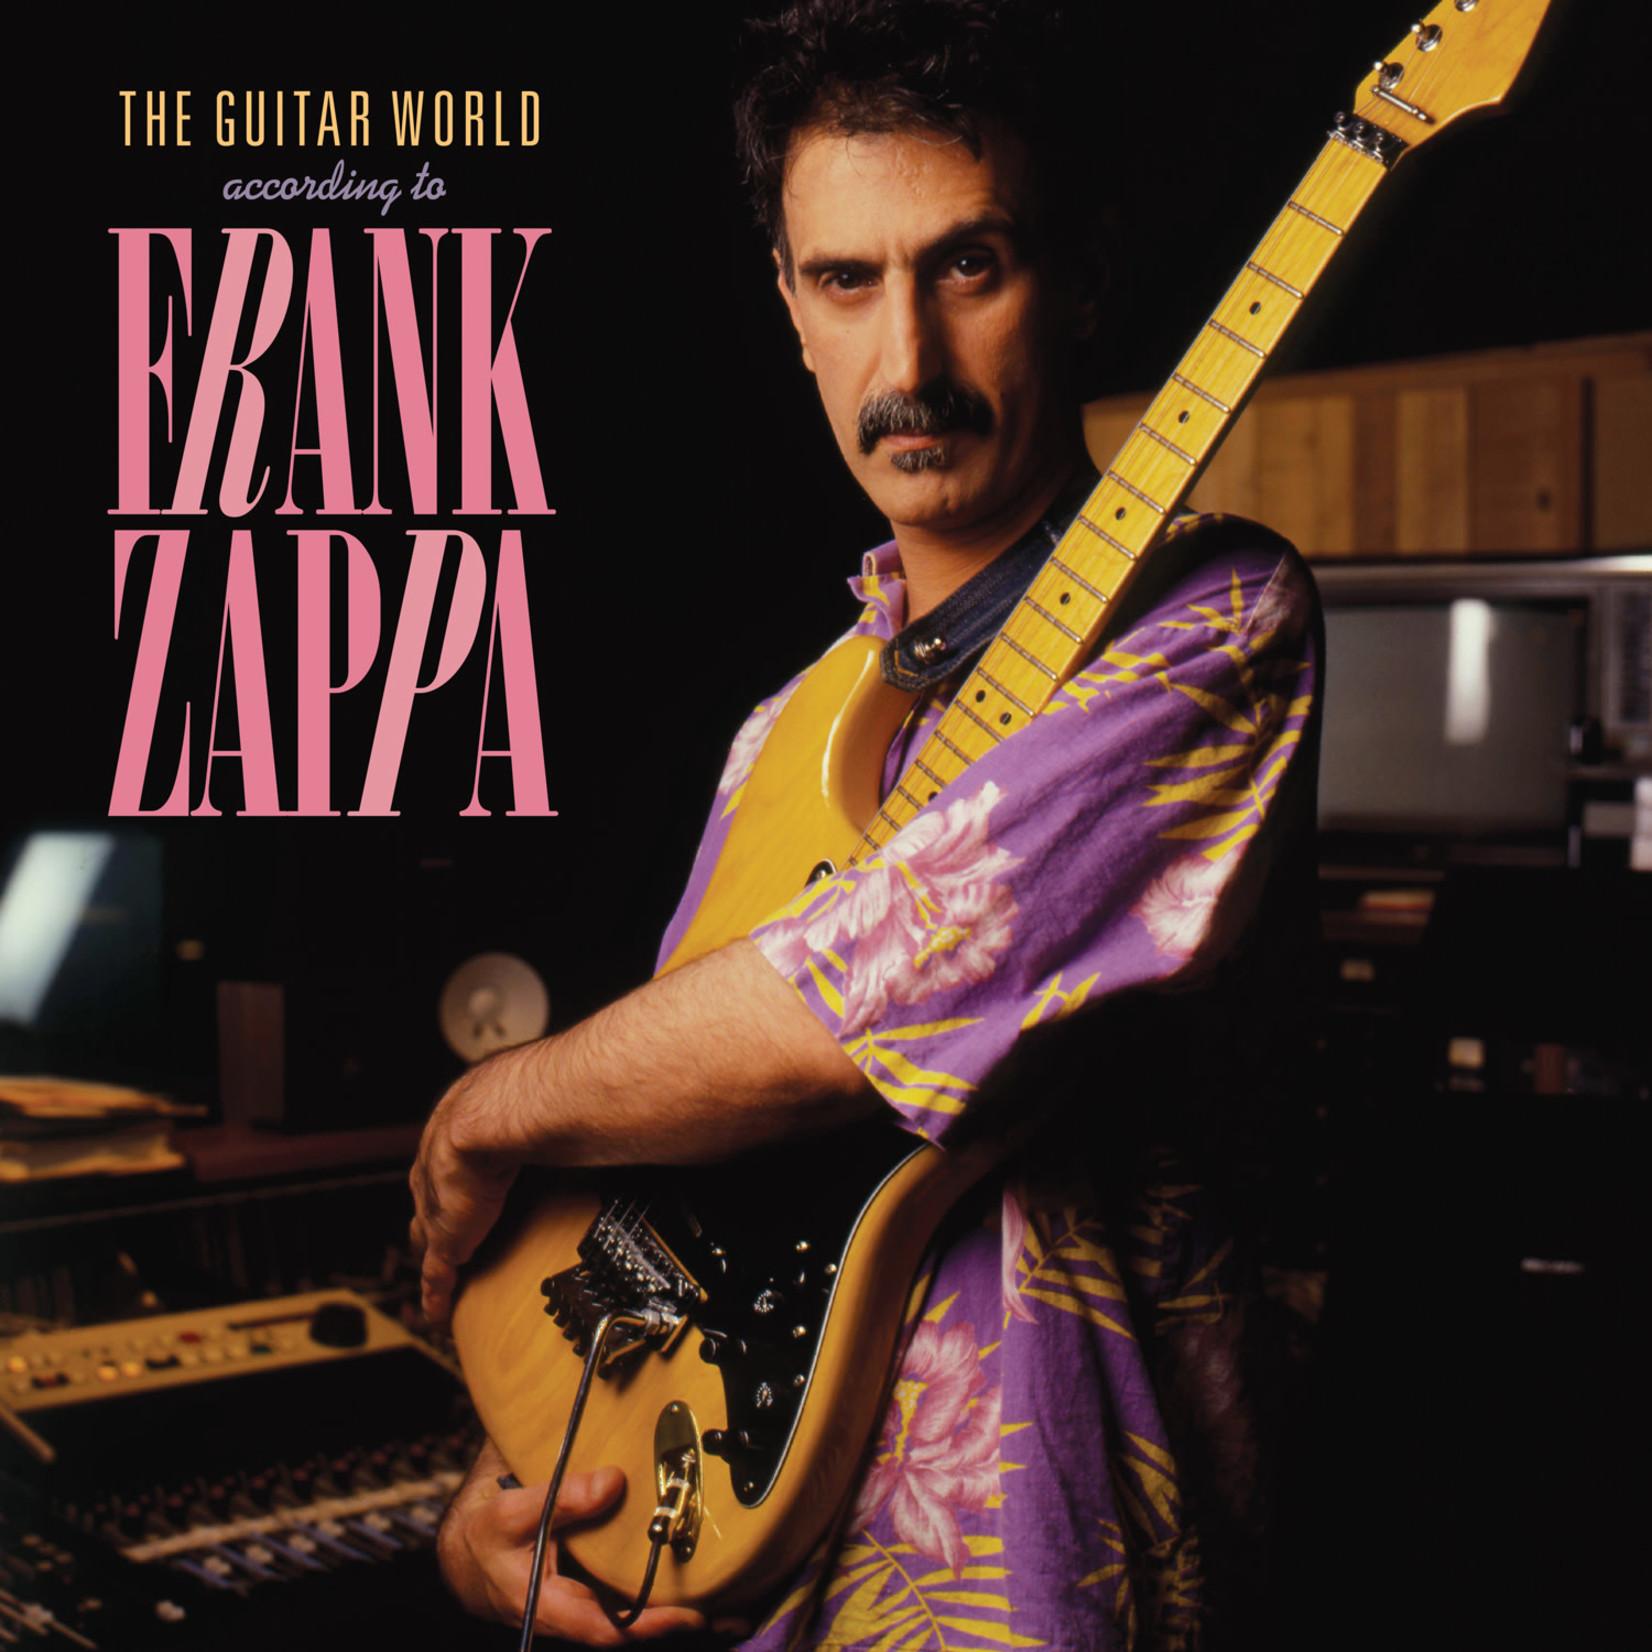 Vinyl Frank Zappa - The Guitar World according to Frank Zappa. $$